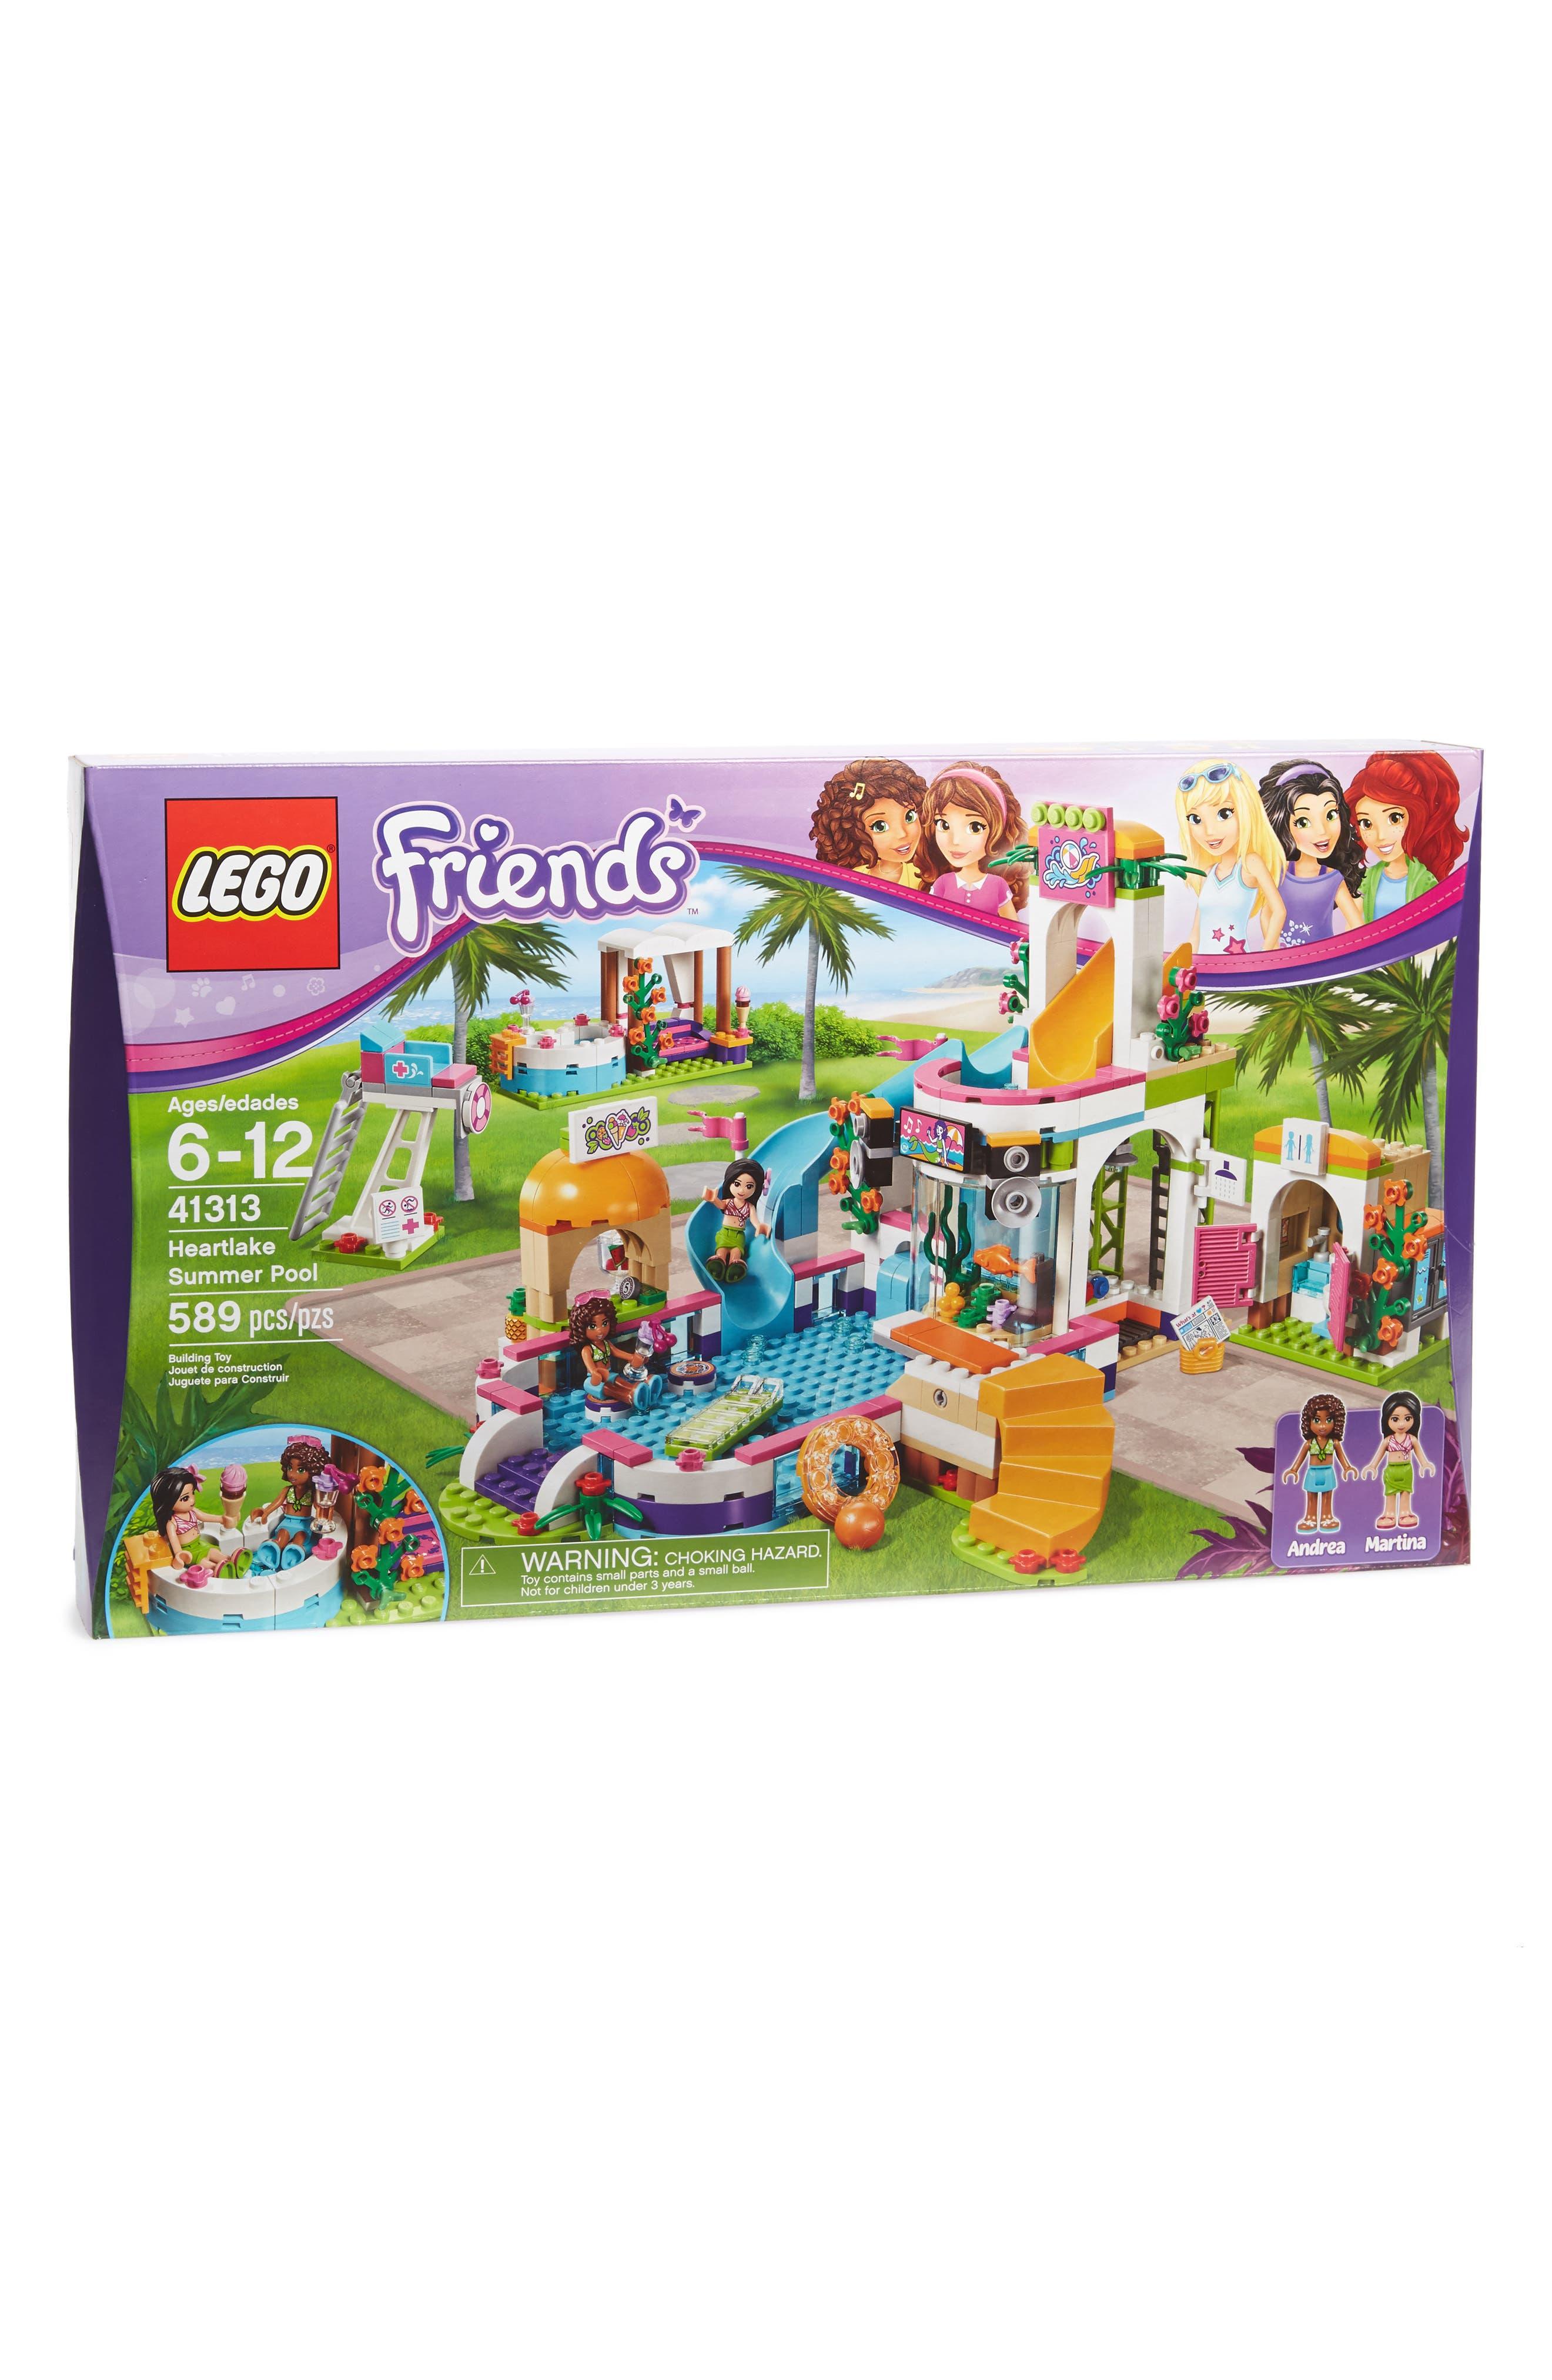 Friends<sup>™</sup> Heartlake Summer Pool - 41313,                         Main,                         color, 500